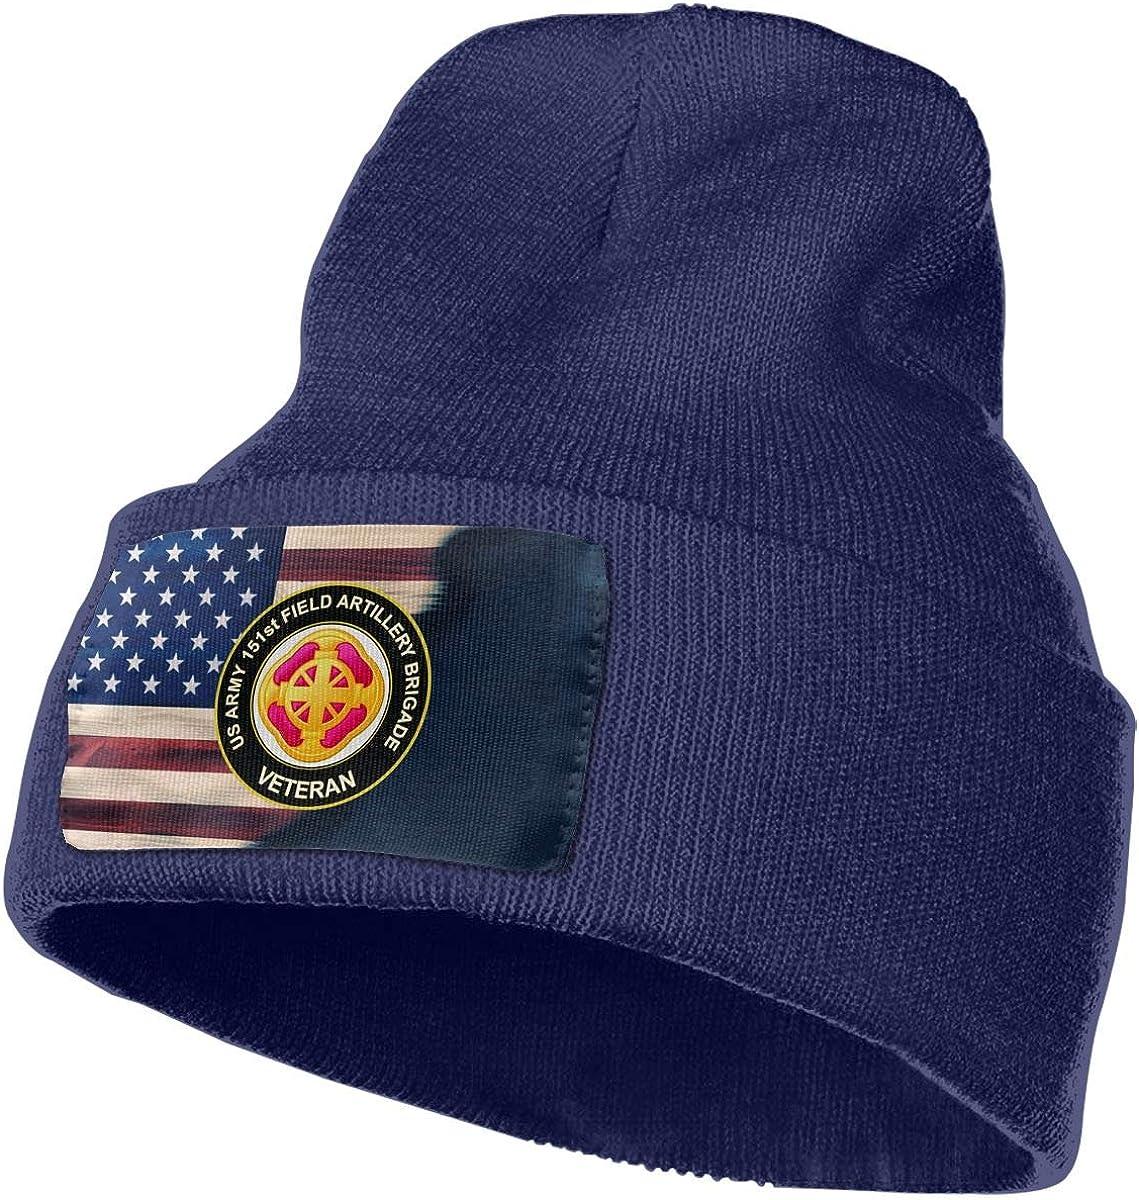 FORDSAN CP US Army 151st Field Artillery Brigade Veteran Mens Beanie Cap Skull Cap Winter Warm Knitting Hats.